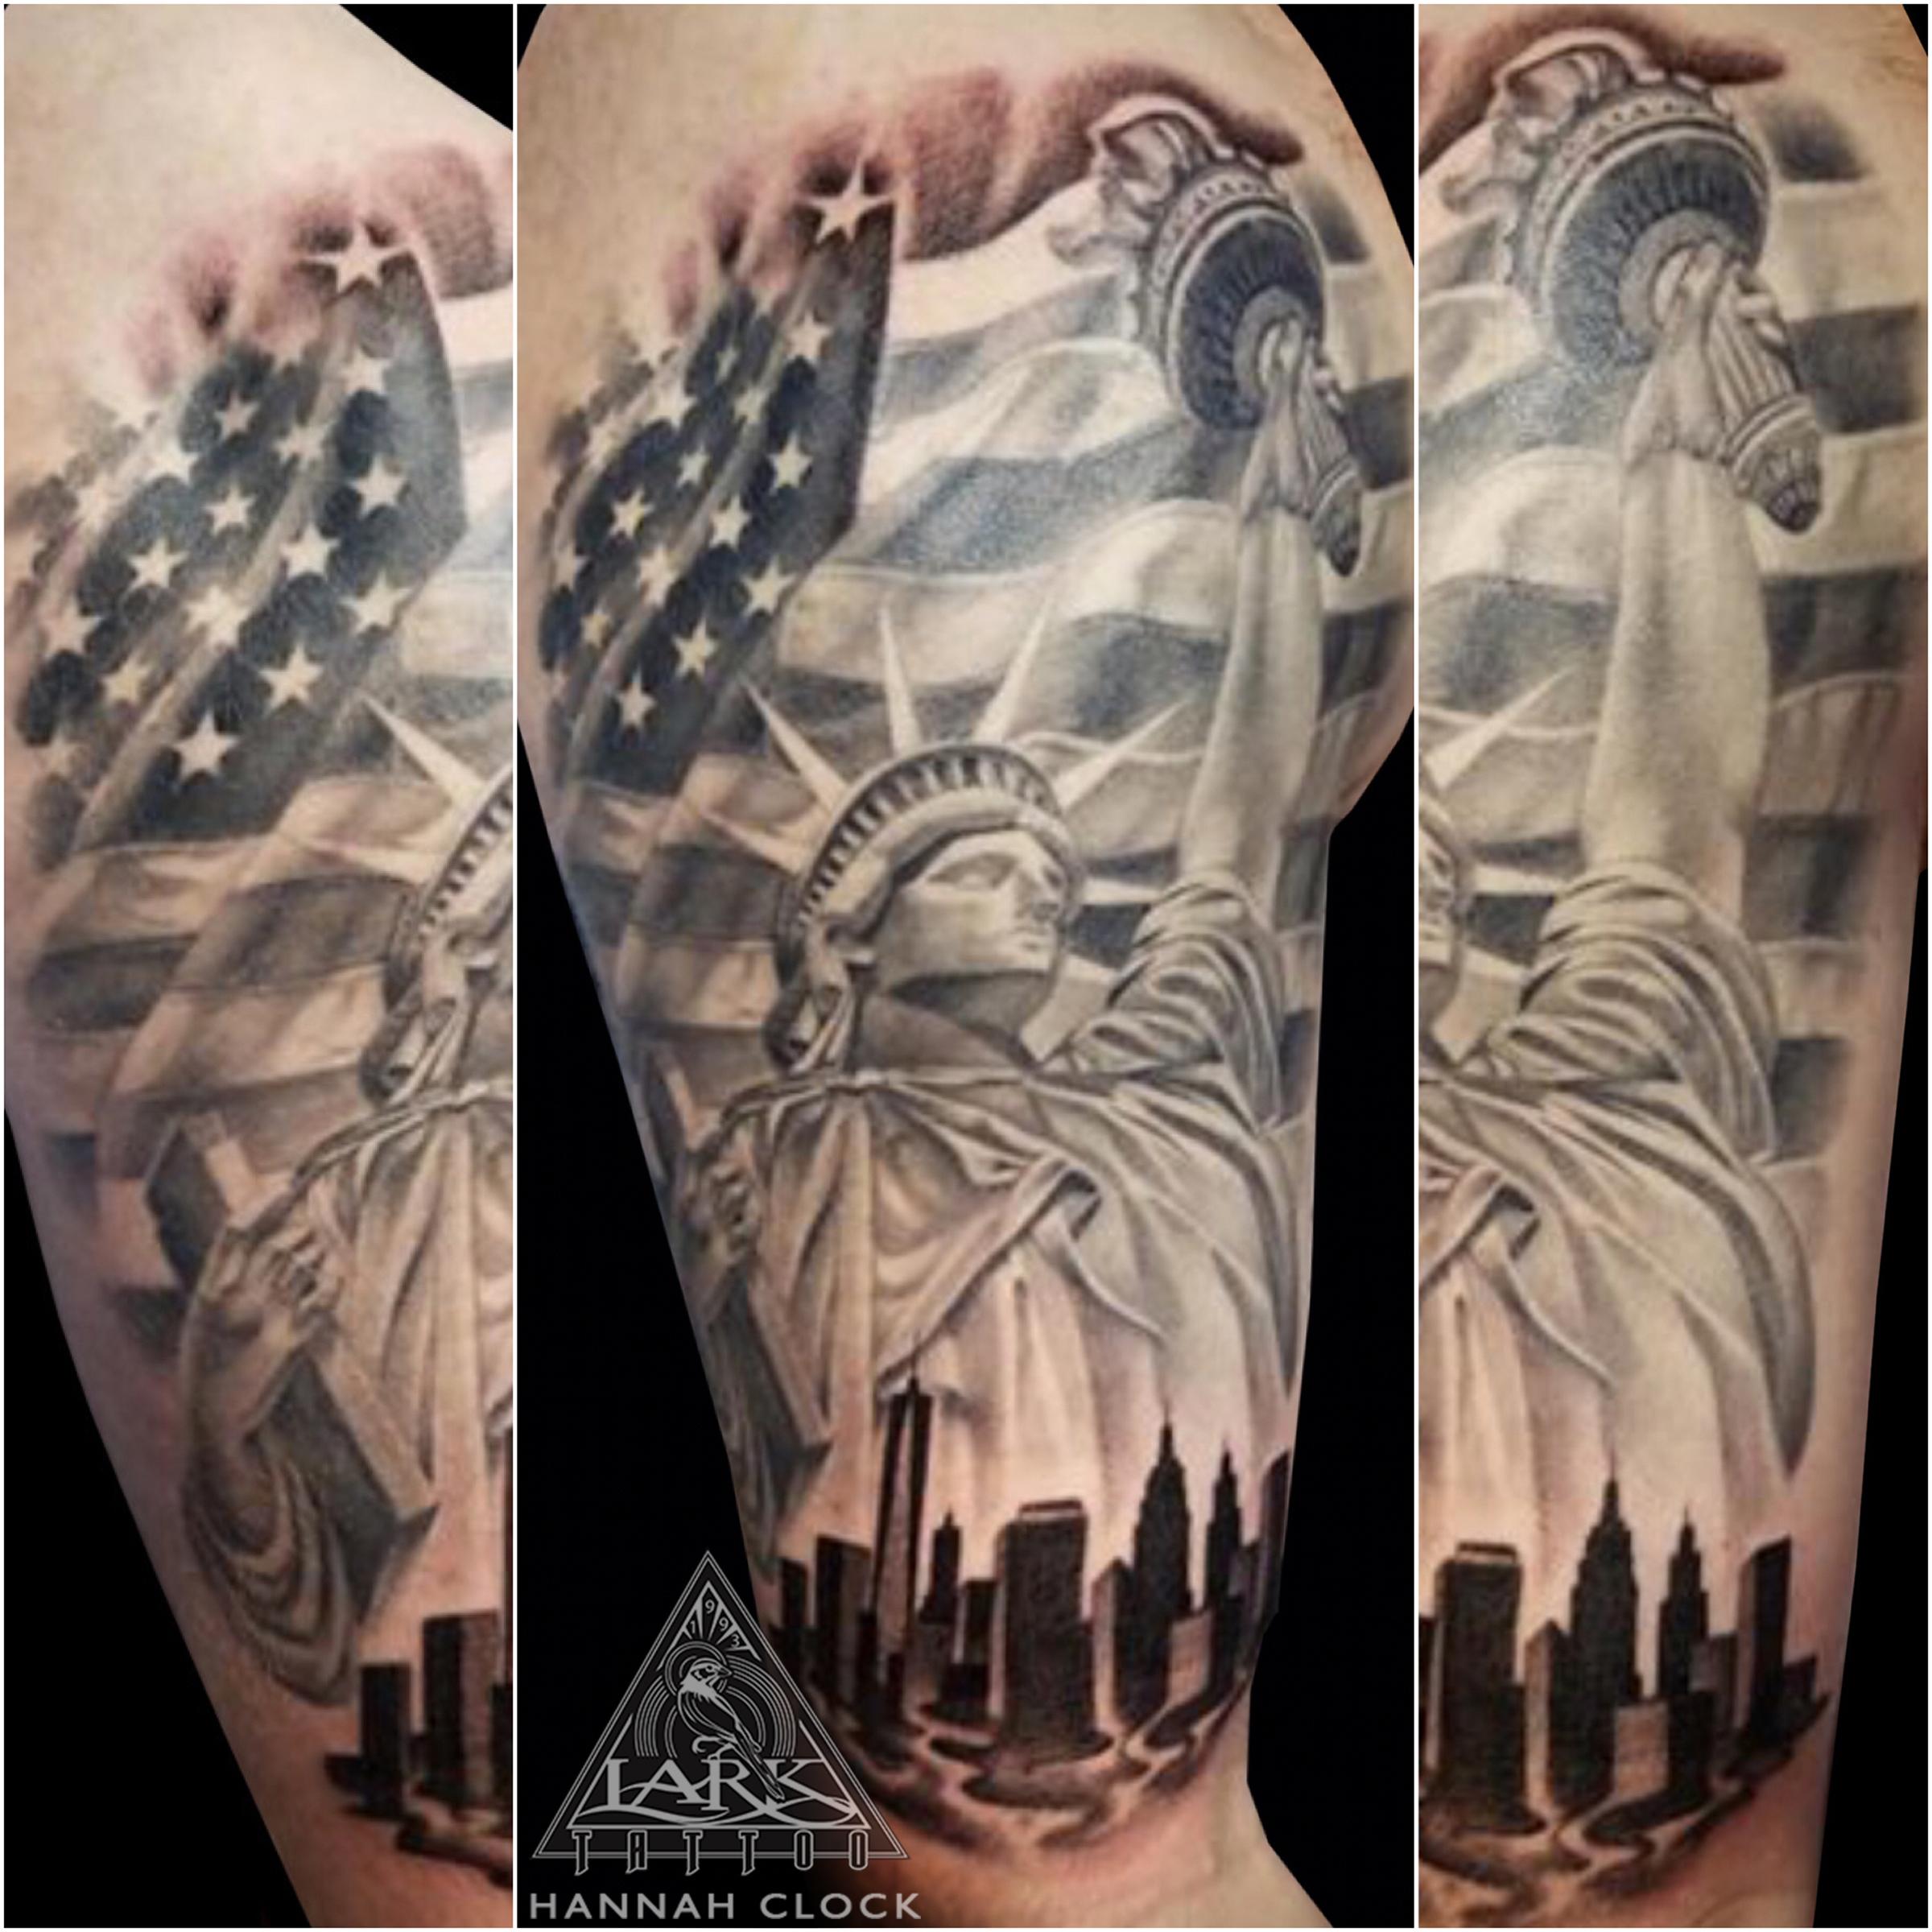 #LarkTattoo #StatueOfLiberty #StatueOfLibertyTattoo #Americana #AmericanaTattoo #America #AmericaTattoo #NYC #NYCTattoo #Flag #FlagTattoo #AmericanFlag #AmericanFlagTattoo #HalfSleeve #HalfSleeveTattoo #LadyTattooer #LadyTattooers #LadyTattooArtist #FemaleTattooer #FemaleTattooArtist #FemaleArtist #BNG #BNGInk #BNGTattoo #BlackAndGray #BlackAndGrayTattoo #BlackAndGrey #BlackAndGreyTattoo #Tattoo #Tattoos #Tat #Tats #Tatts #Tatted #Tattedup #Tattoist #Tattooed #Inked #InkedUp #Ink #TattooOfTheDay #AmazingInk #BodyArt #LongIslandTattooArtist #LongIslandTattooer #LarkTattoos #LarkTattooWestbury #Westbury #LongIsland #NY #NewYork #USA #Art